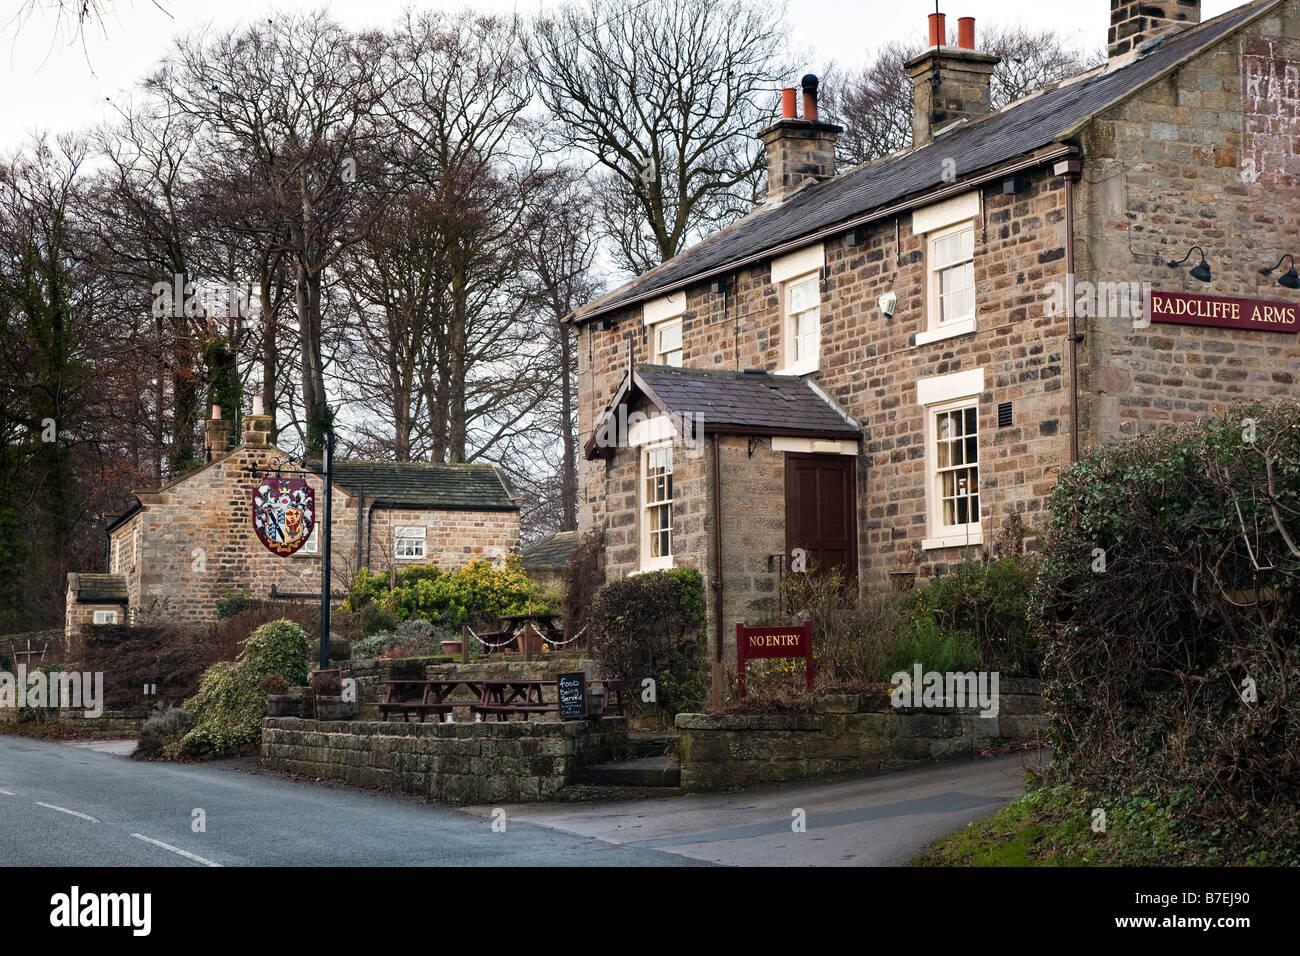 Radcliffe Arms Pannal Road Follifoot Village near Harrogate North Yorkshire Stock Photo